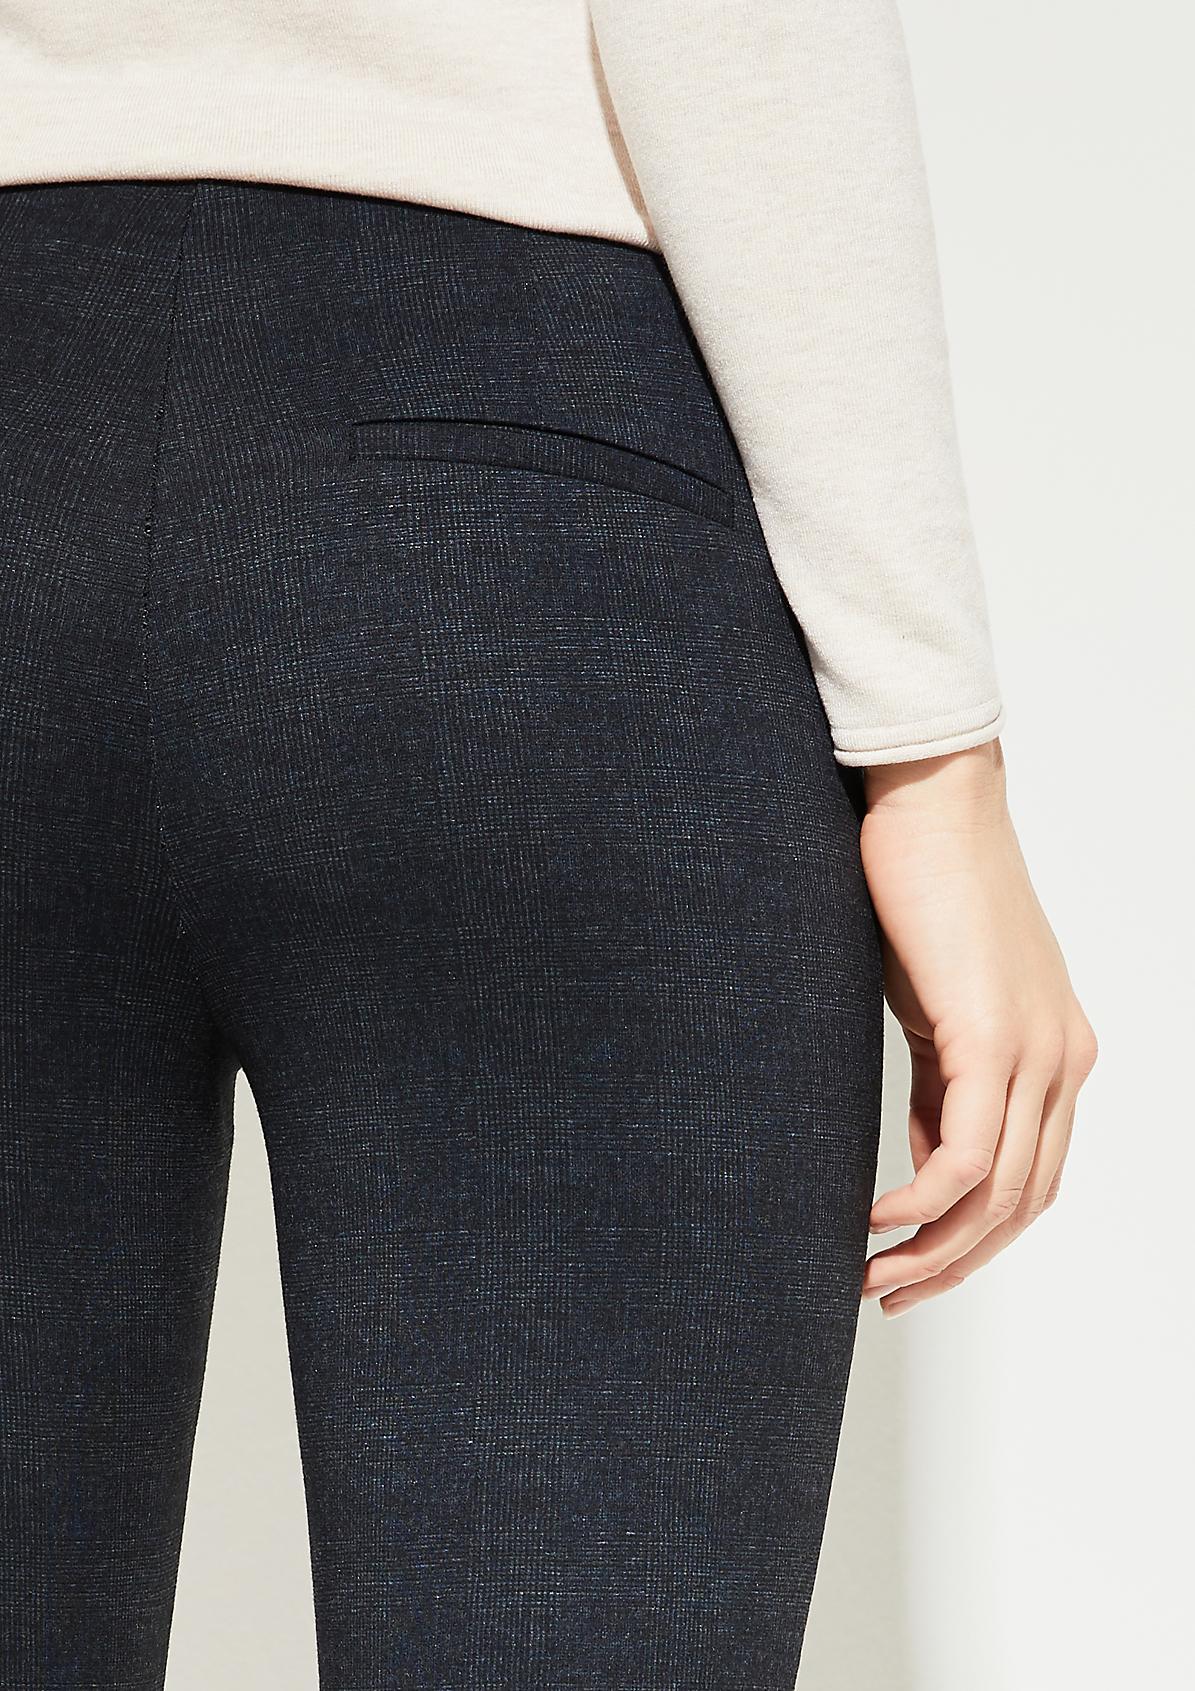 Skinny Fit: Skinny ankle leg-Hose aus elastischer Qualität